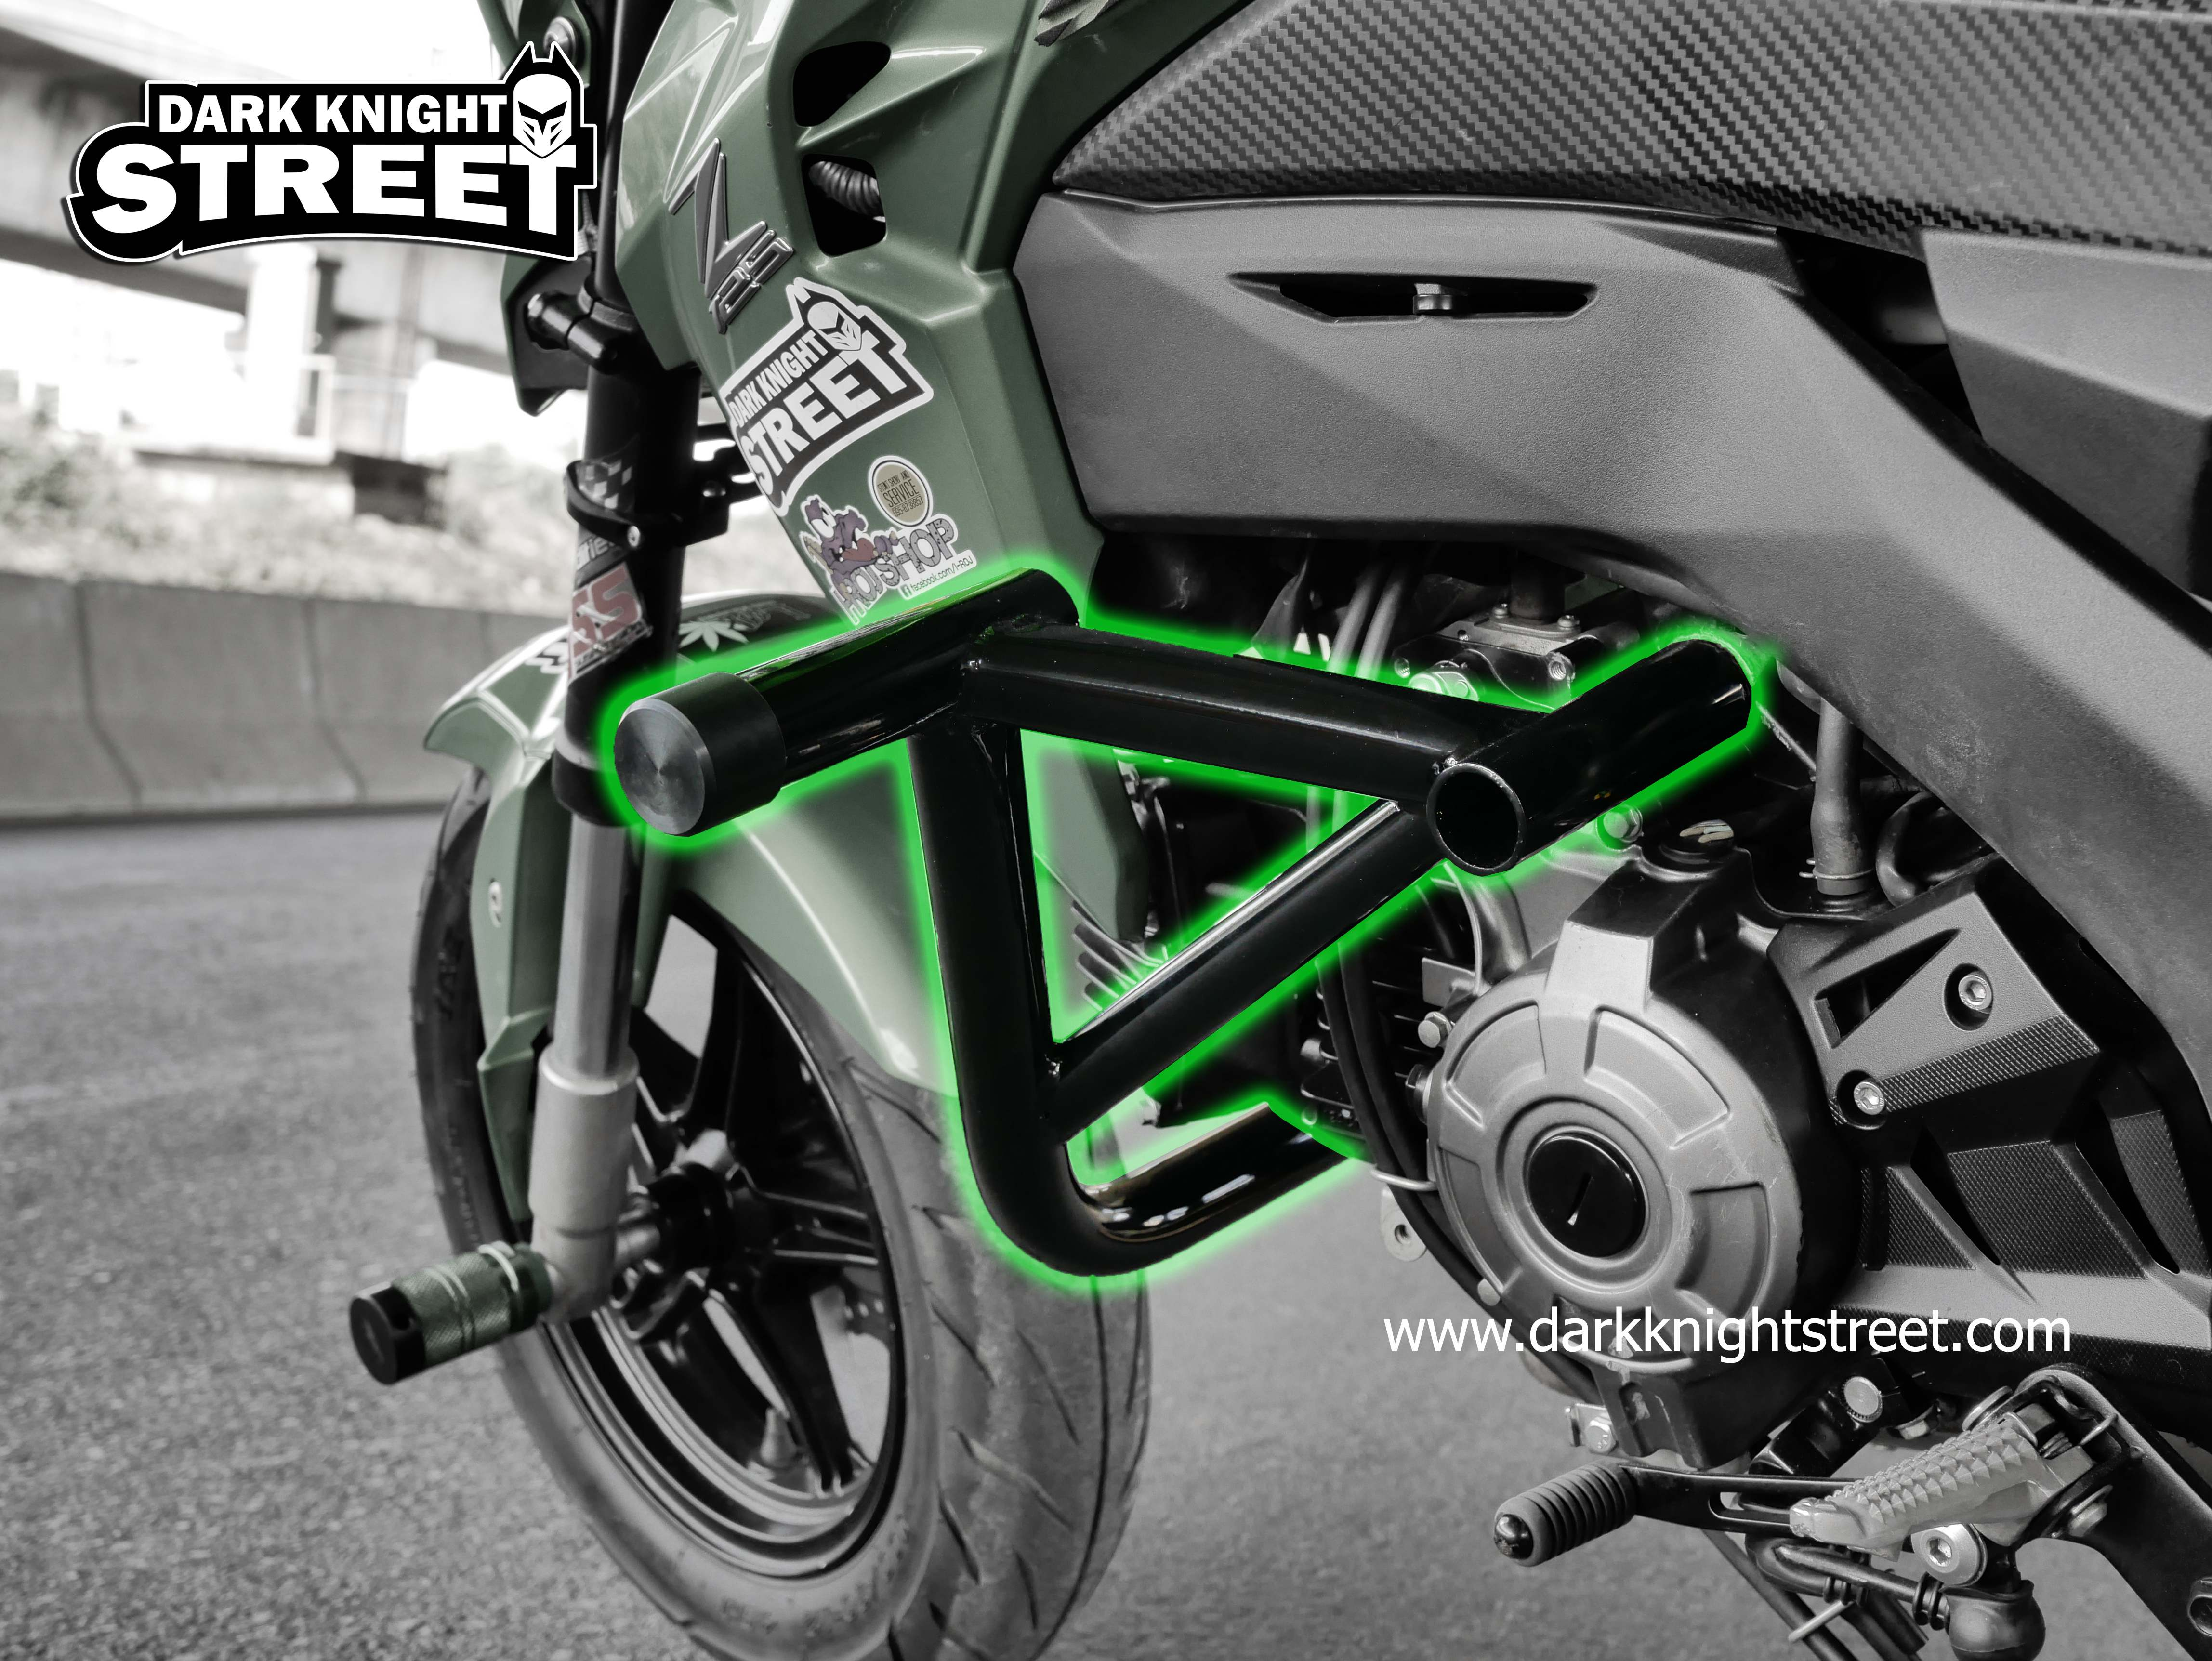 Kawasaki Z125 Crash cage + 12 bar subcage all black